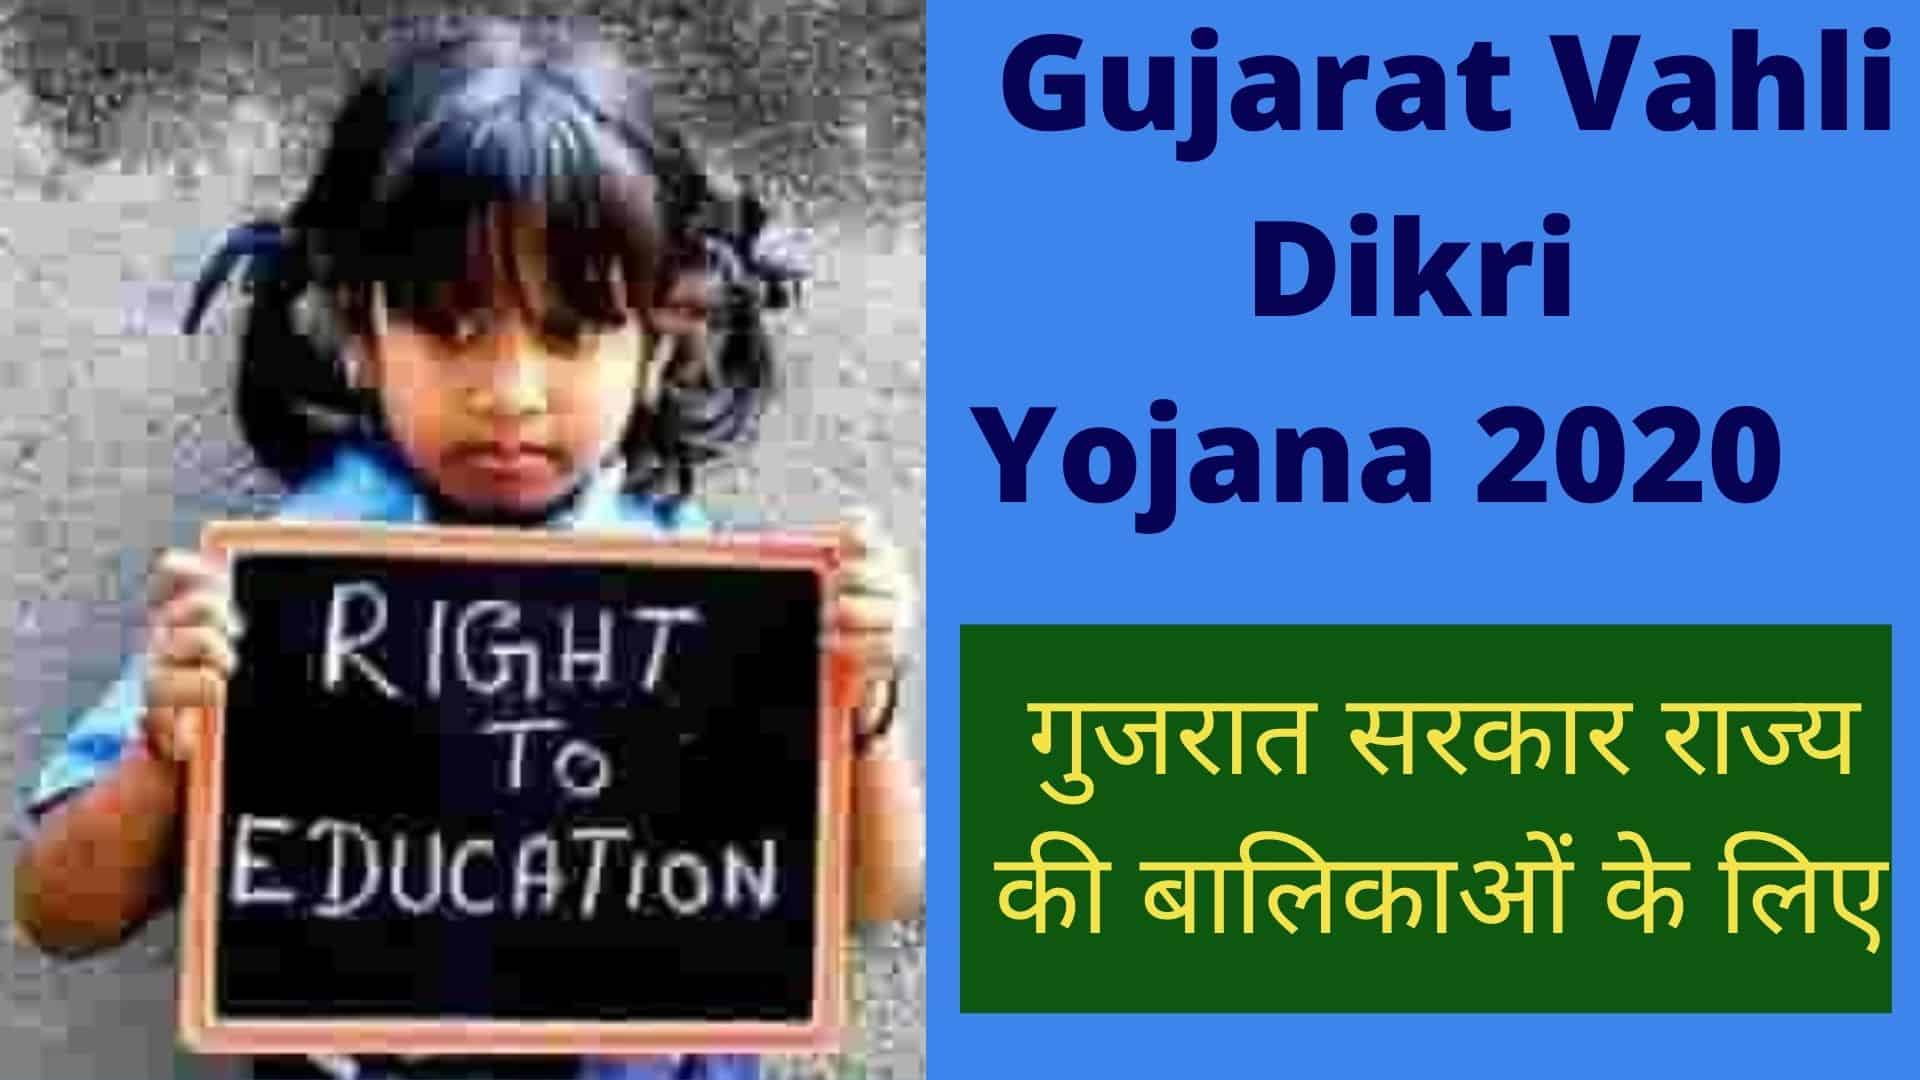 Gujarat Vahli Dikri Yojana 2020 आवेदन_ पंजीकरण फॉर्म